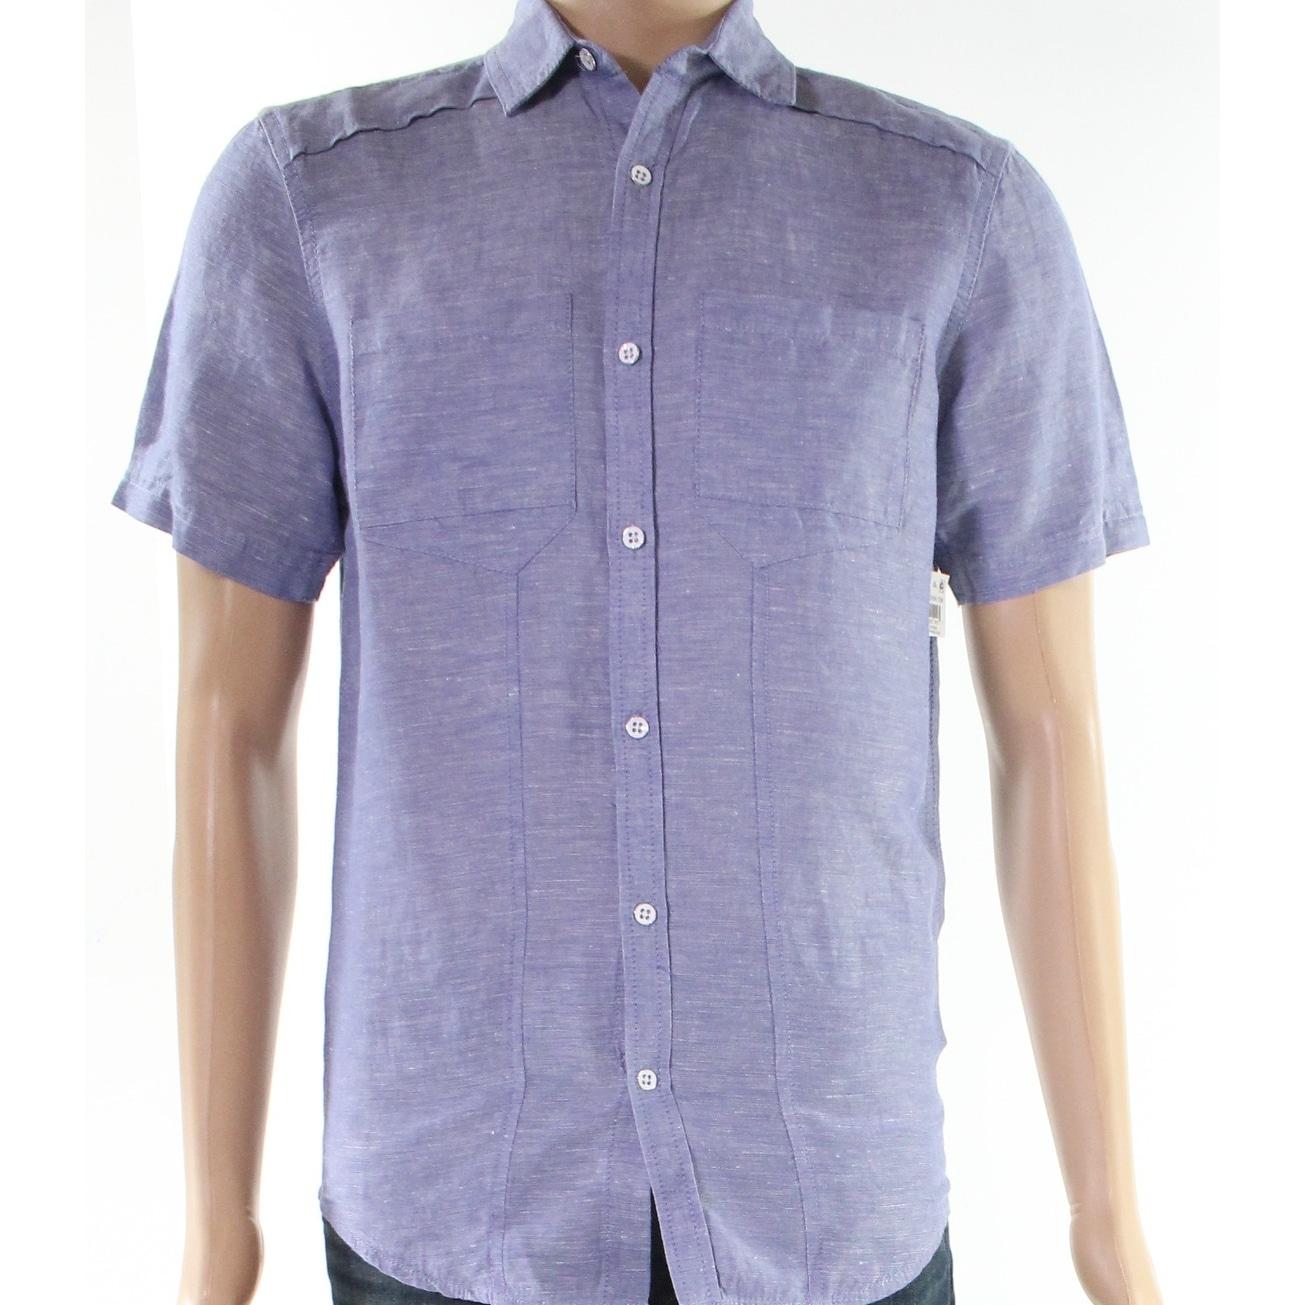 INC Hydrangea Mens Solid Pocket Button Down Shirt Blue 3XL